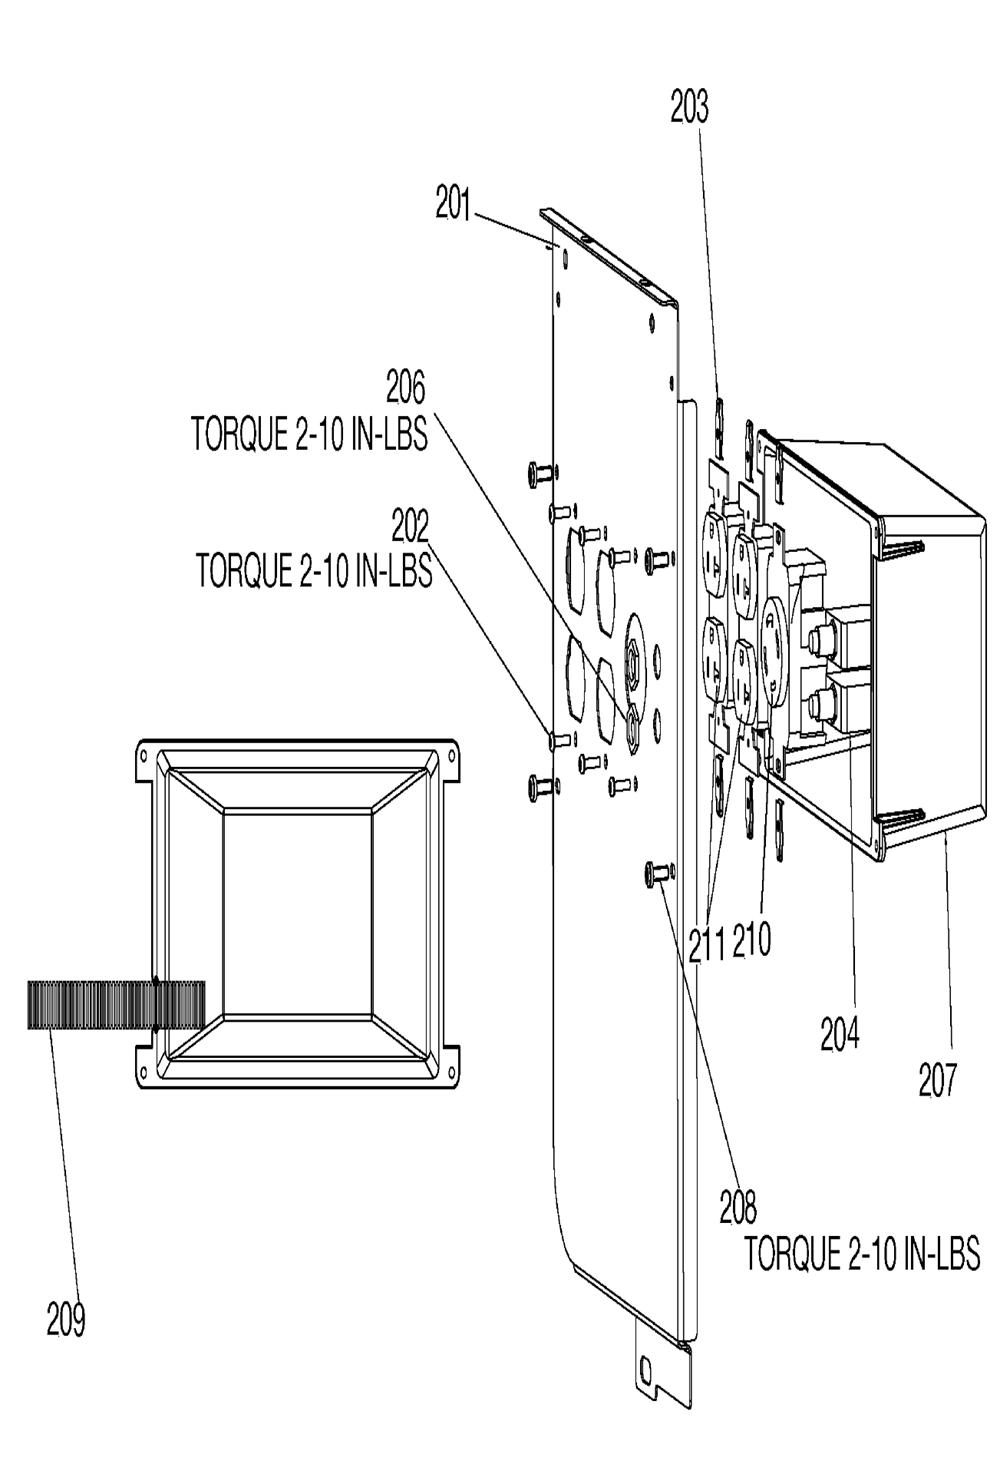 BSI550-W-portercable-T1-PB-4Break Down